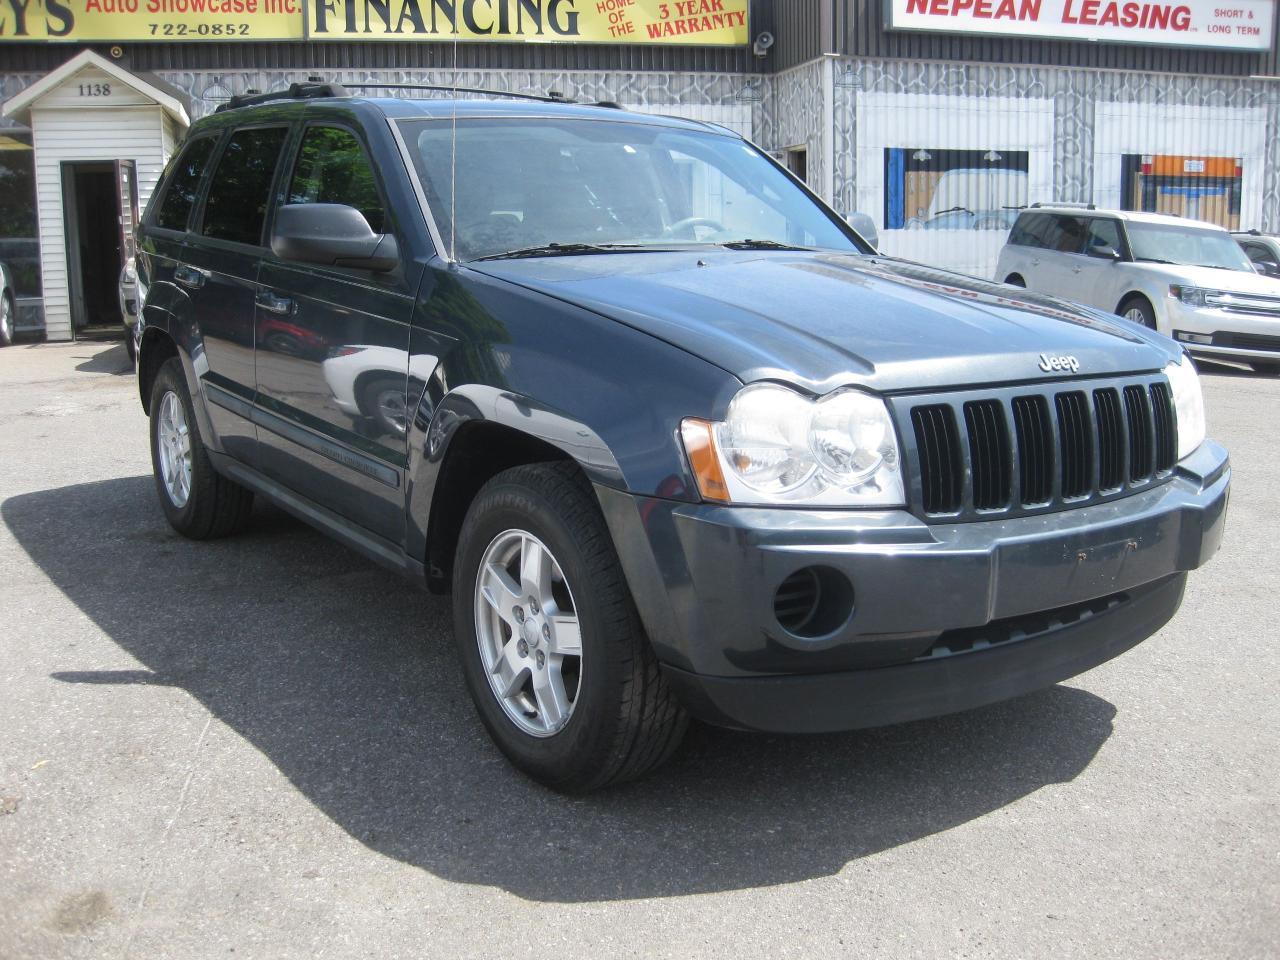 2007 Jeep Grand Cherokee Laredo AC 4WD Cruise PL PM PW